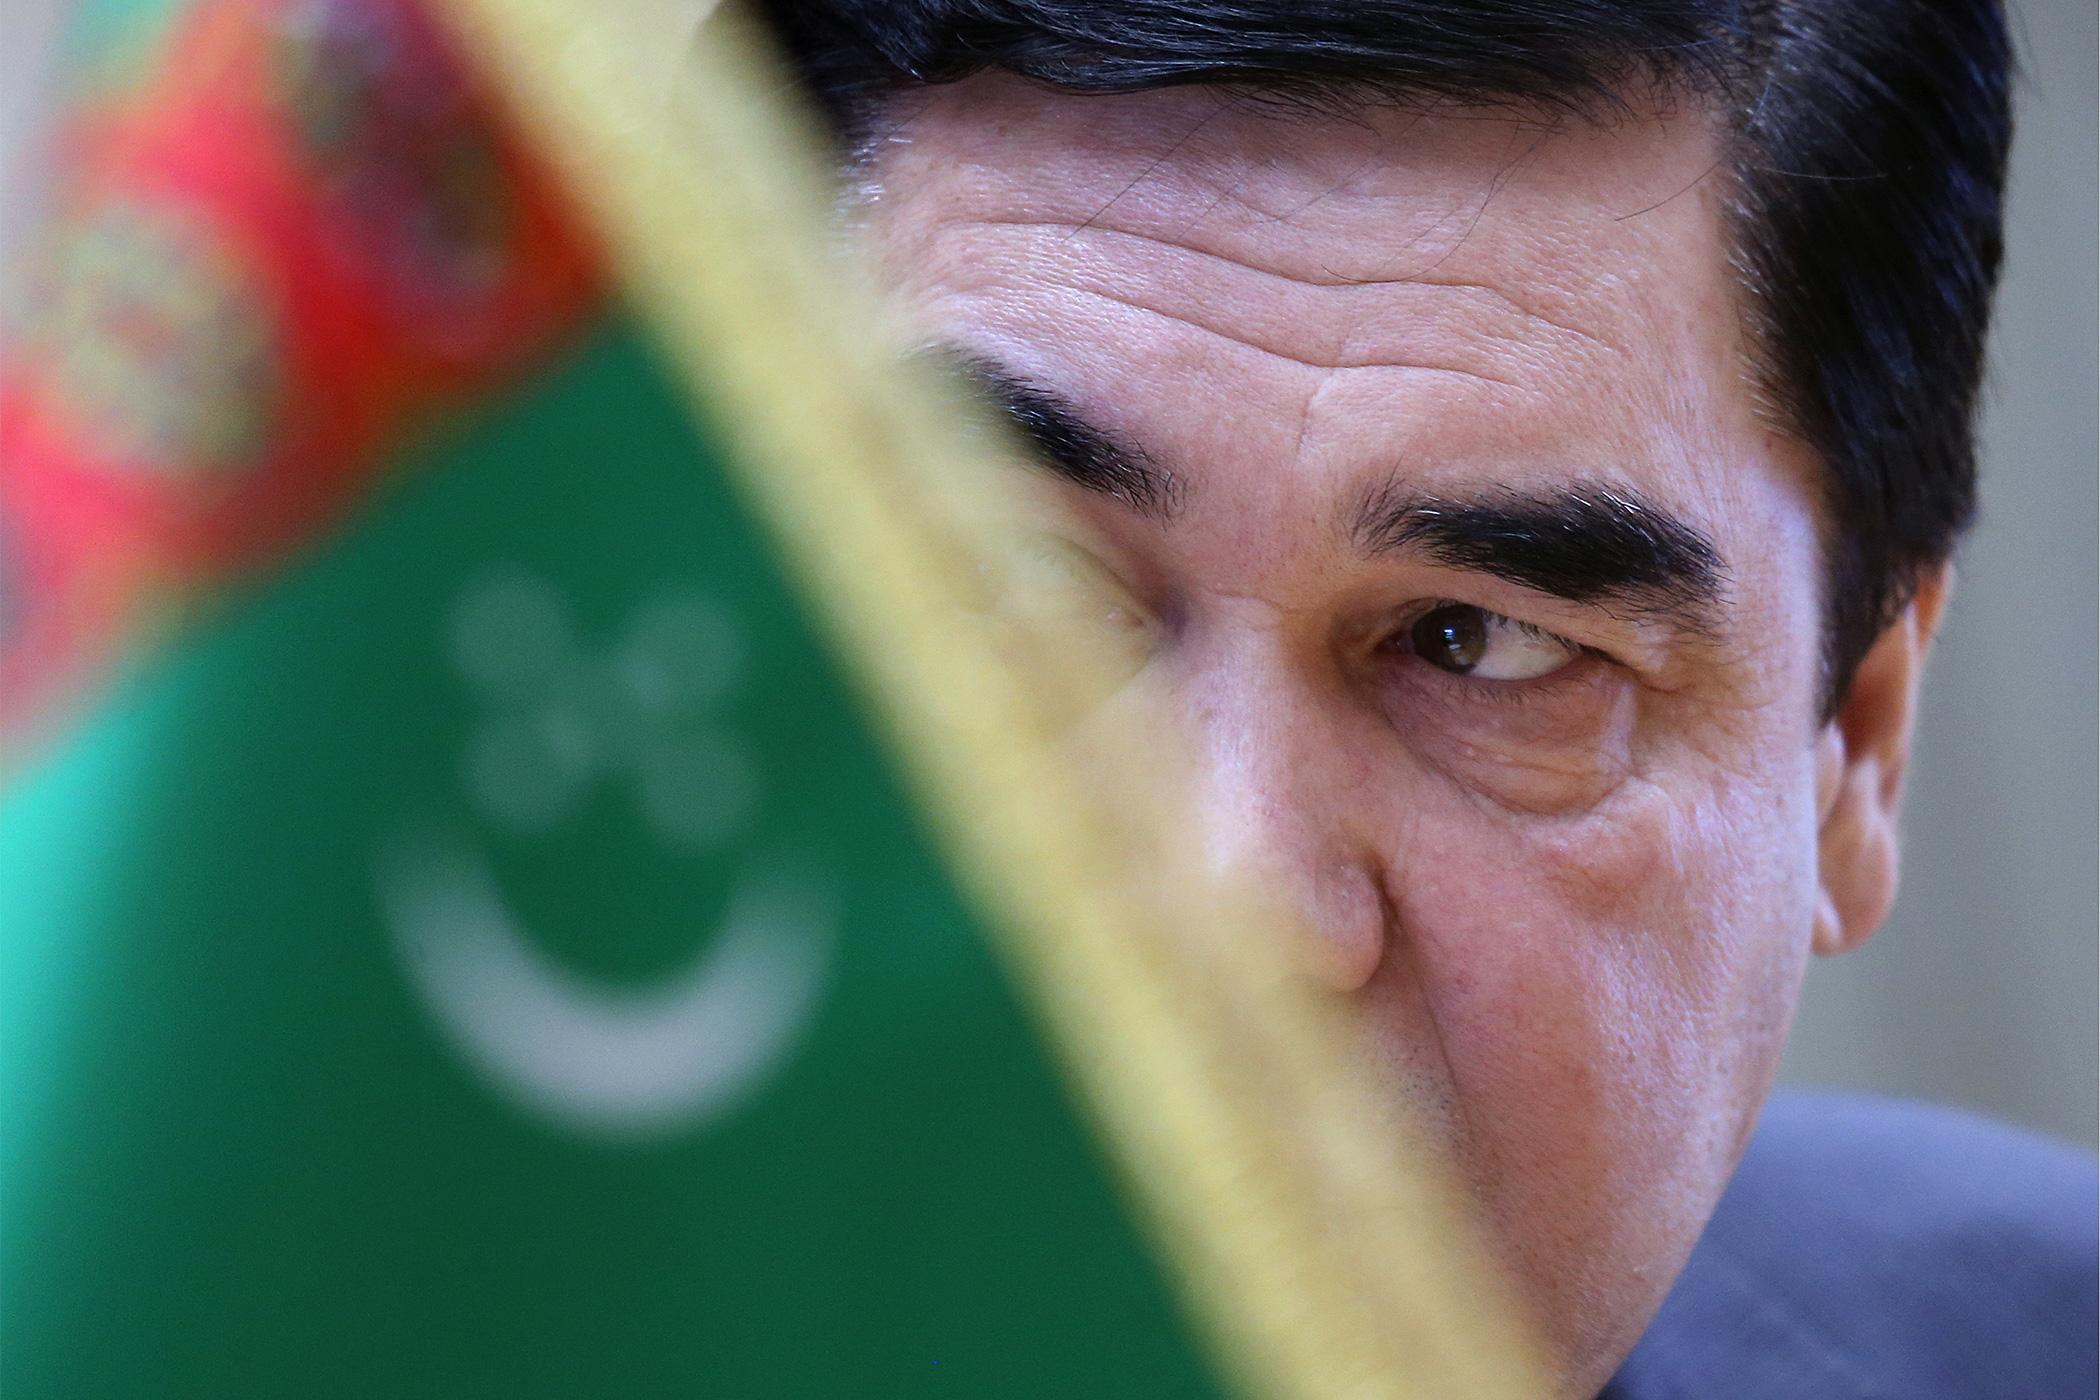 RFE/RL condemns Turkmenistan's treatment of journalists